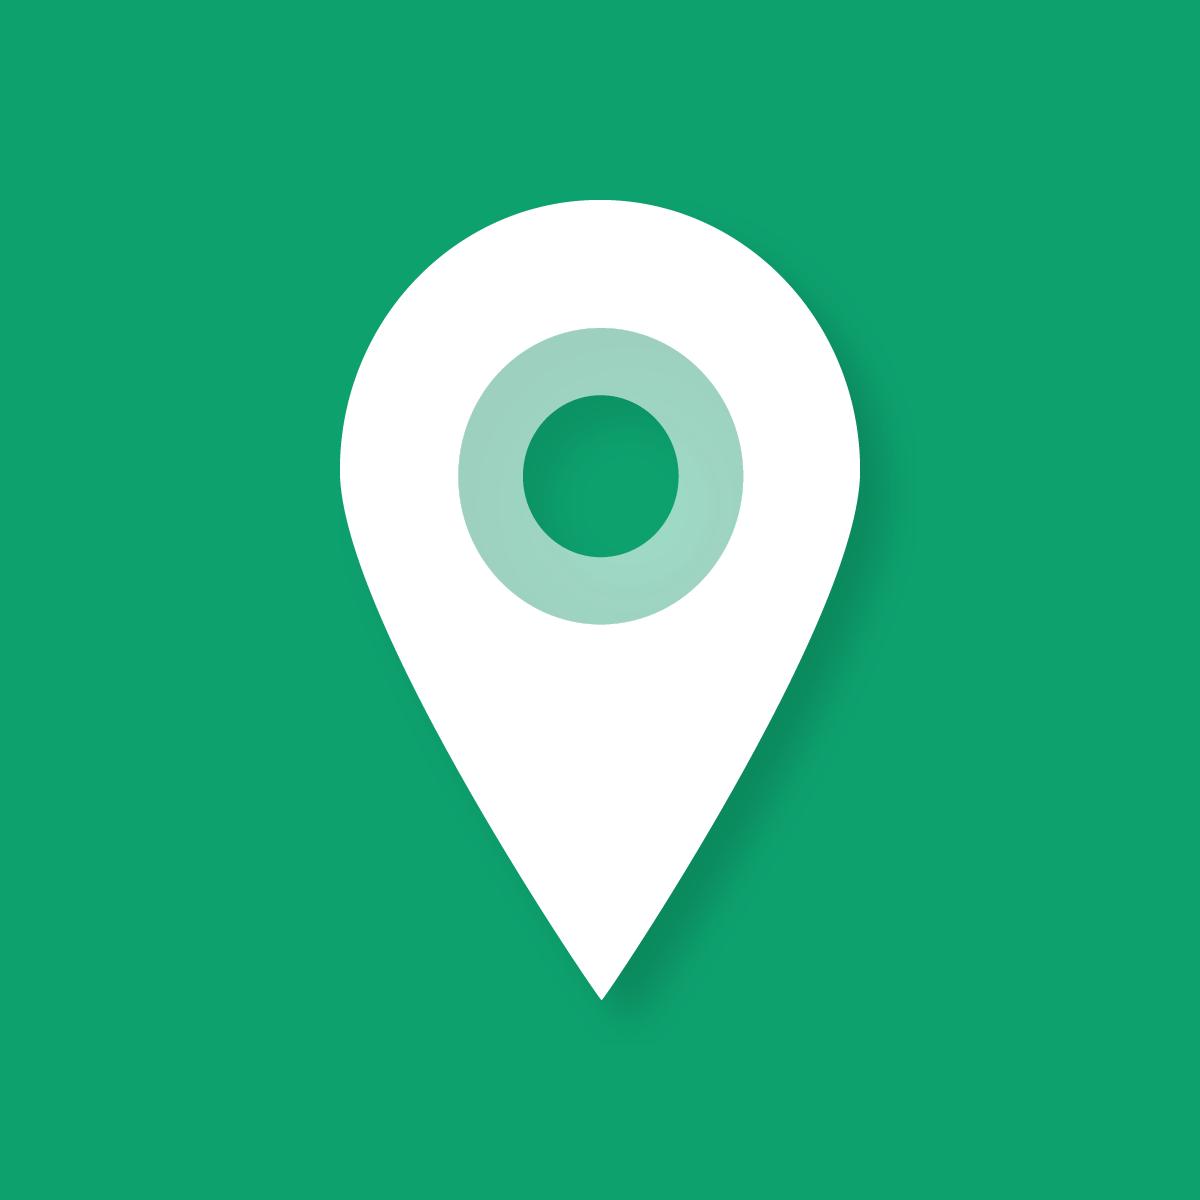 Shopify Google Maps app by Stockist